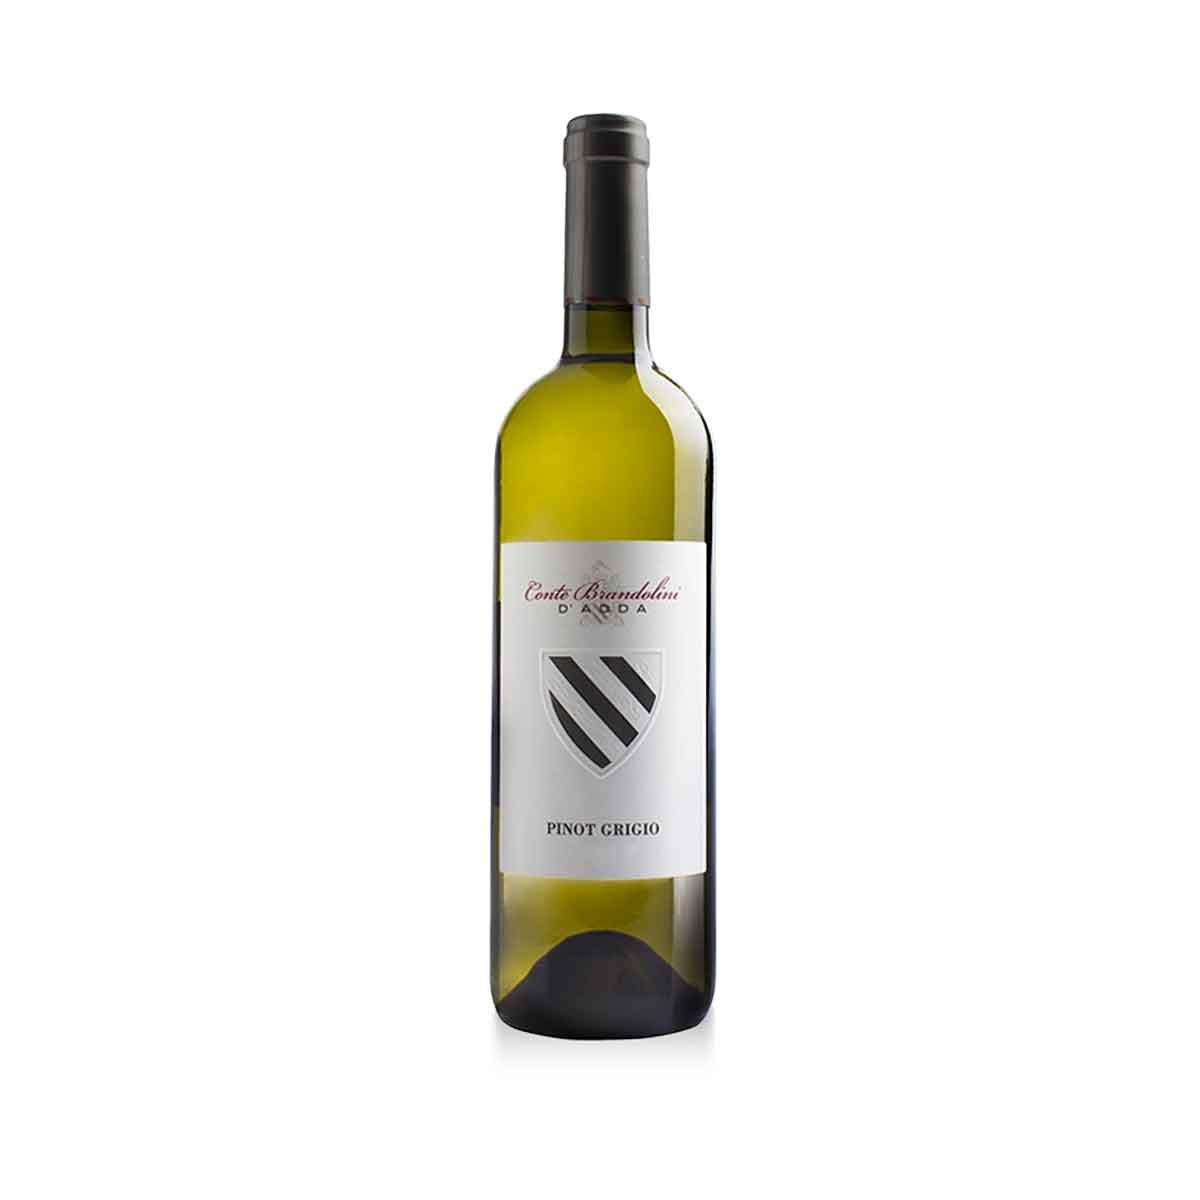 Friuli Grave Pinot Grigio, Vistorta